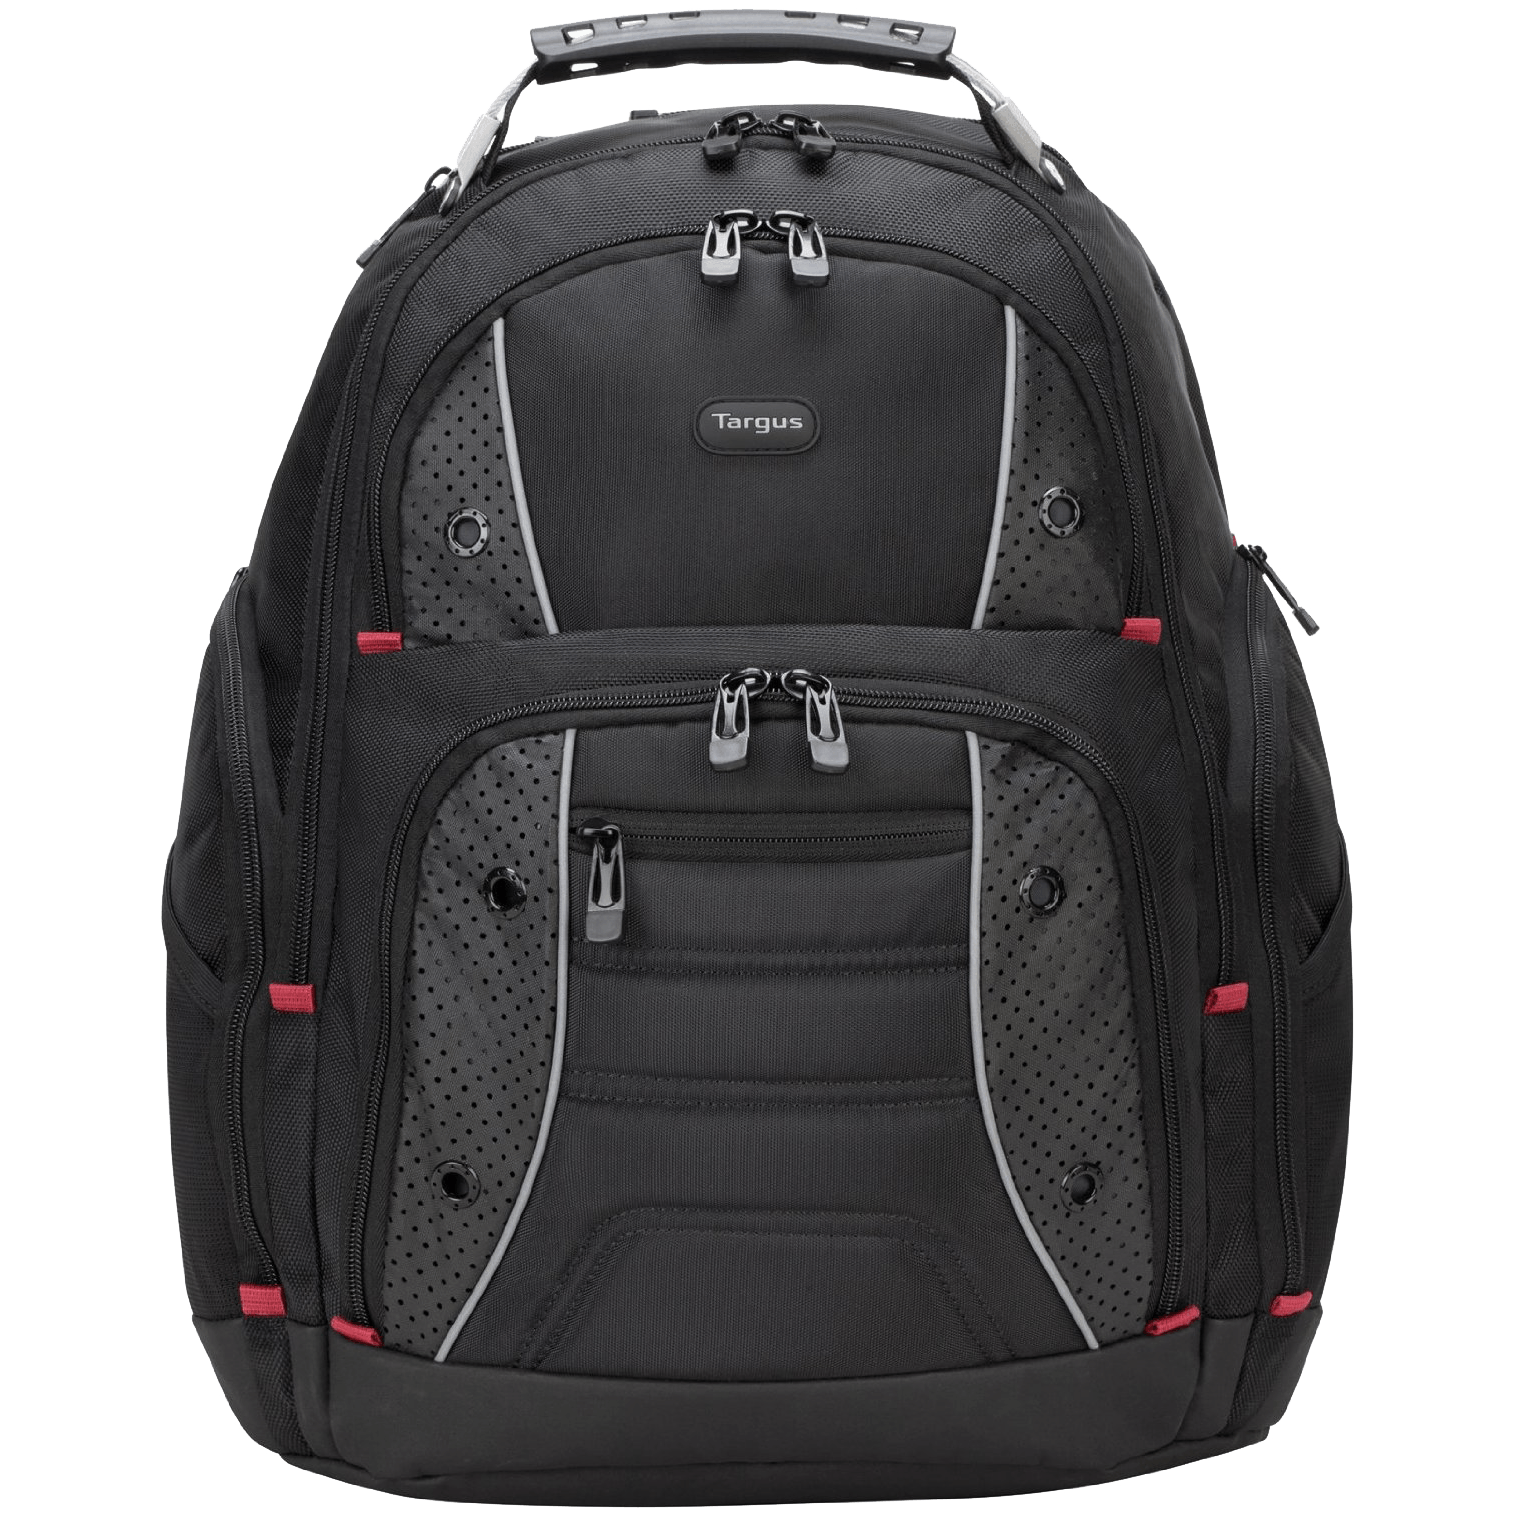 targus drifter ii backpack review